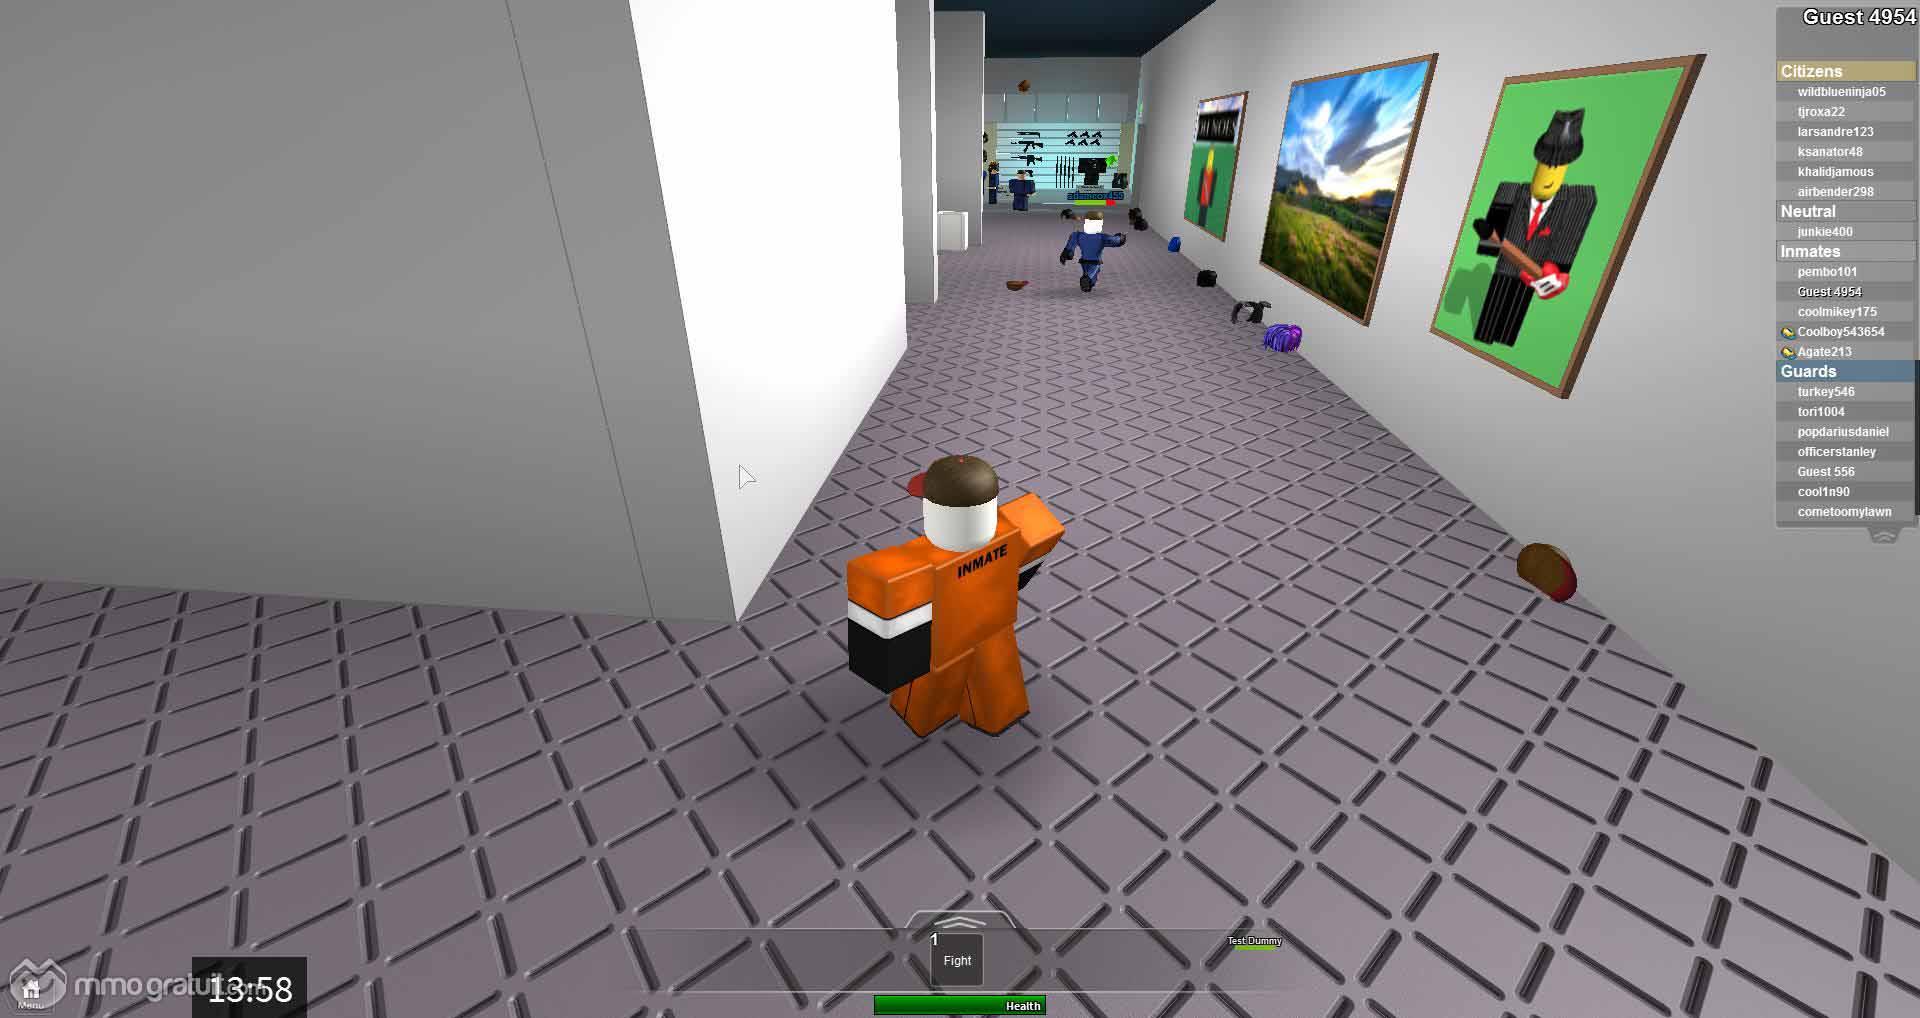 Fandom Code Unboxing Simulator | StrucidCodes.com